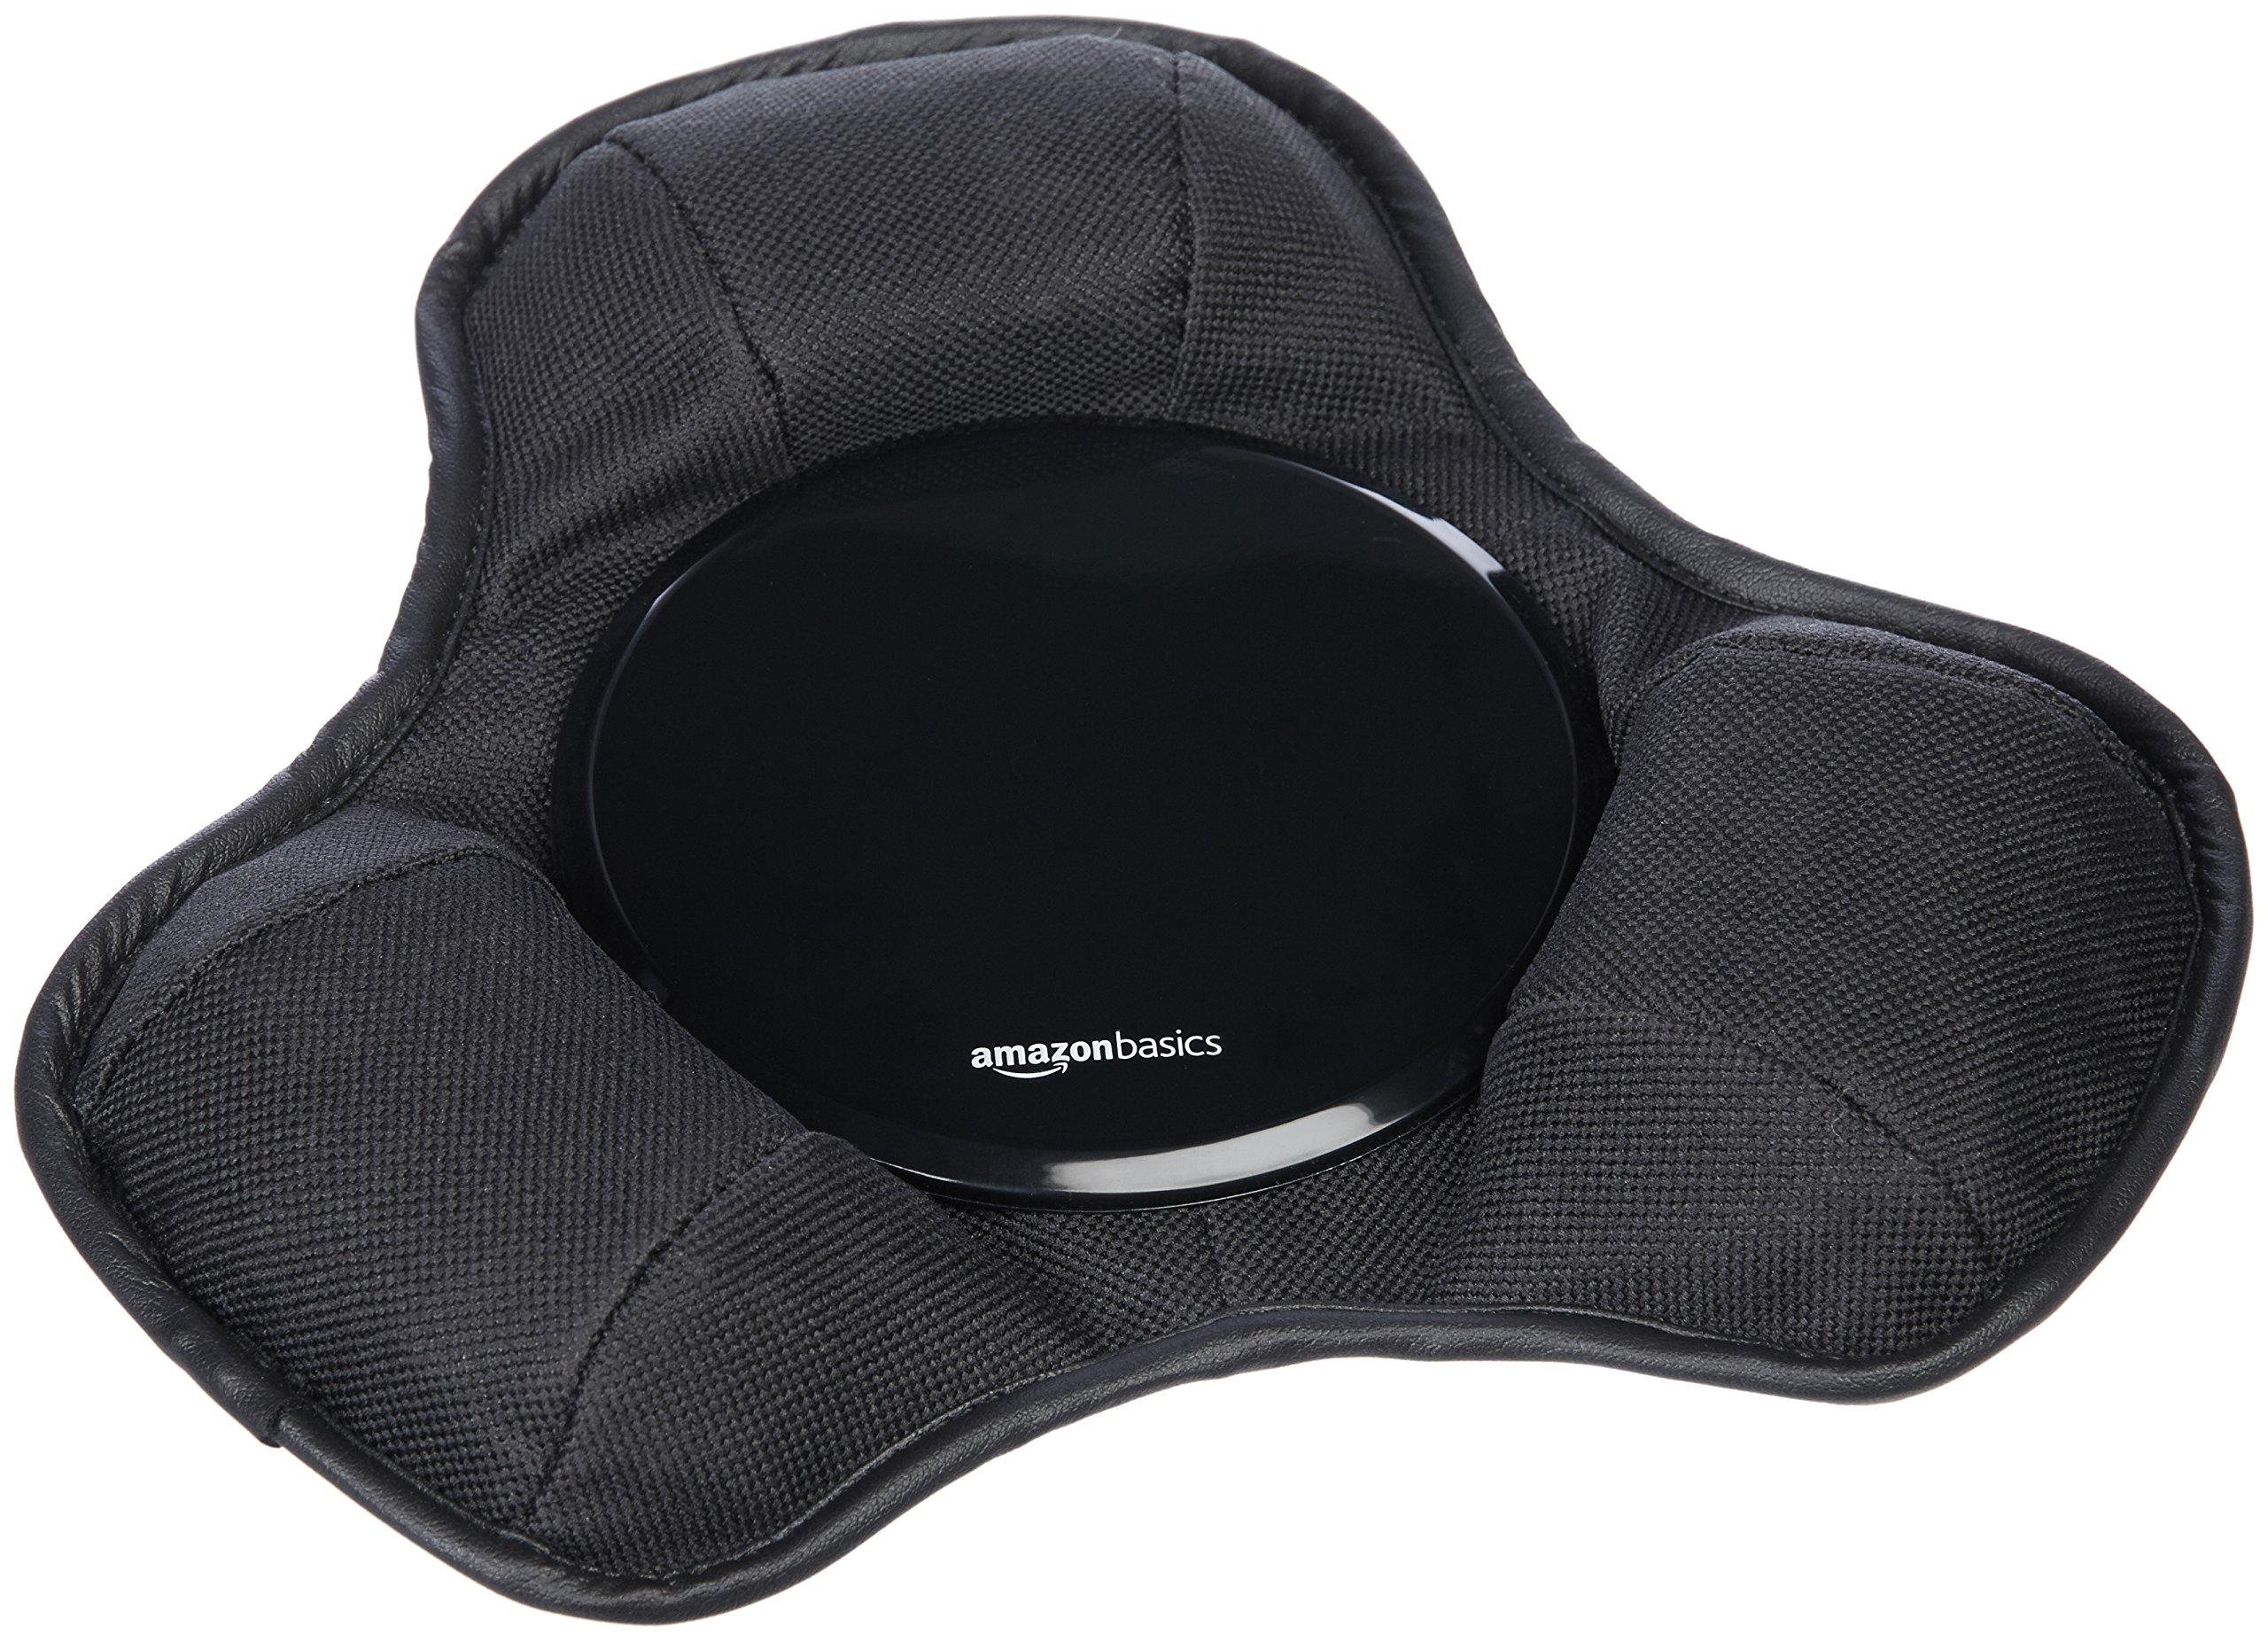 AmazonBasics Dashboard Magellan Portable Navigators